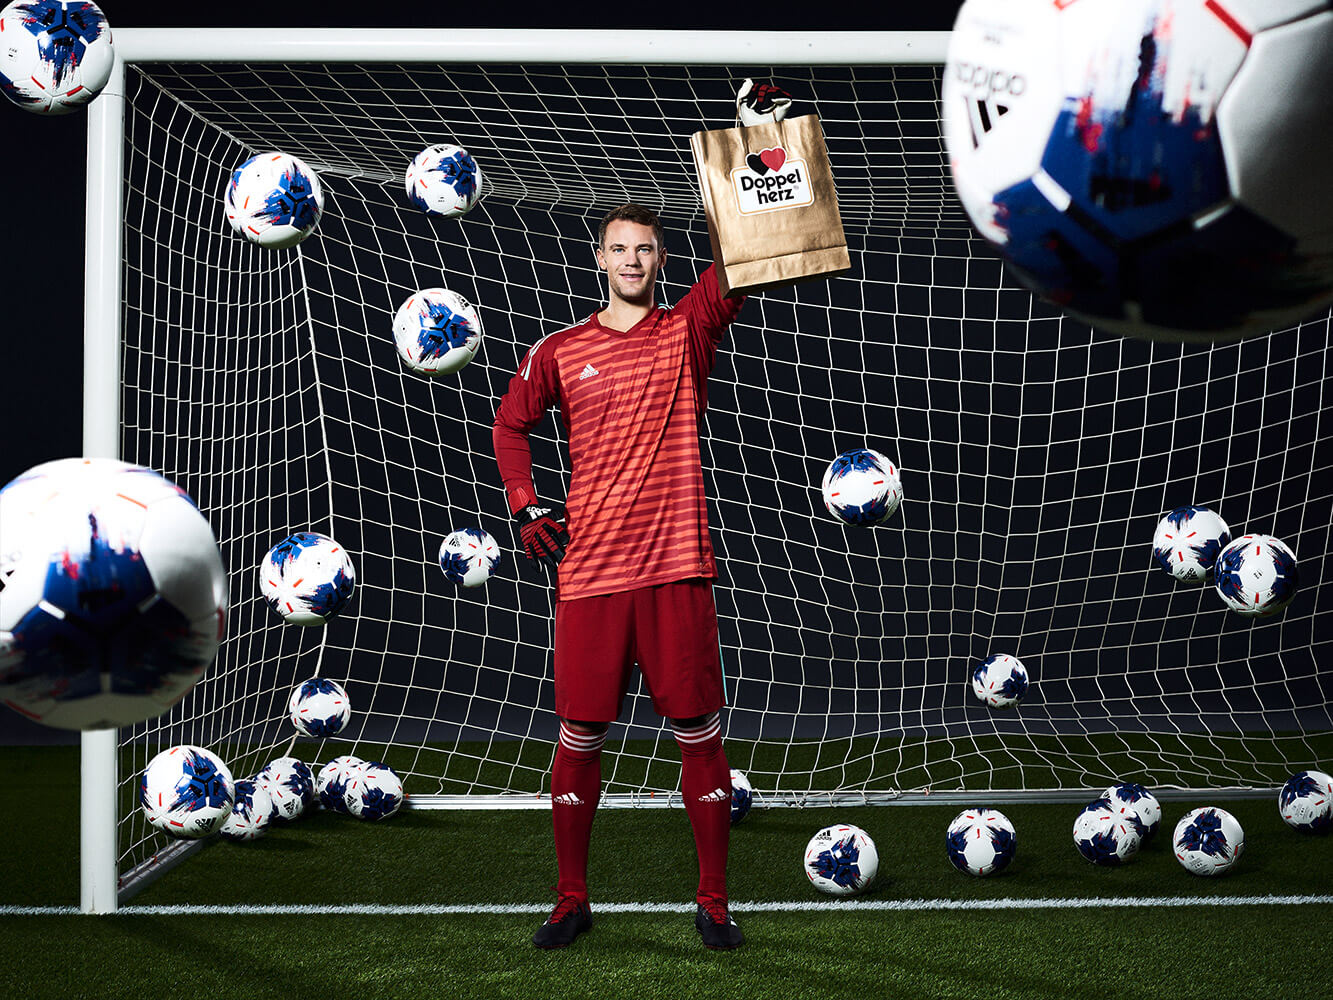 Manuel Neuer Doppelherz Queisser Pharma Volle Bude